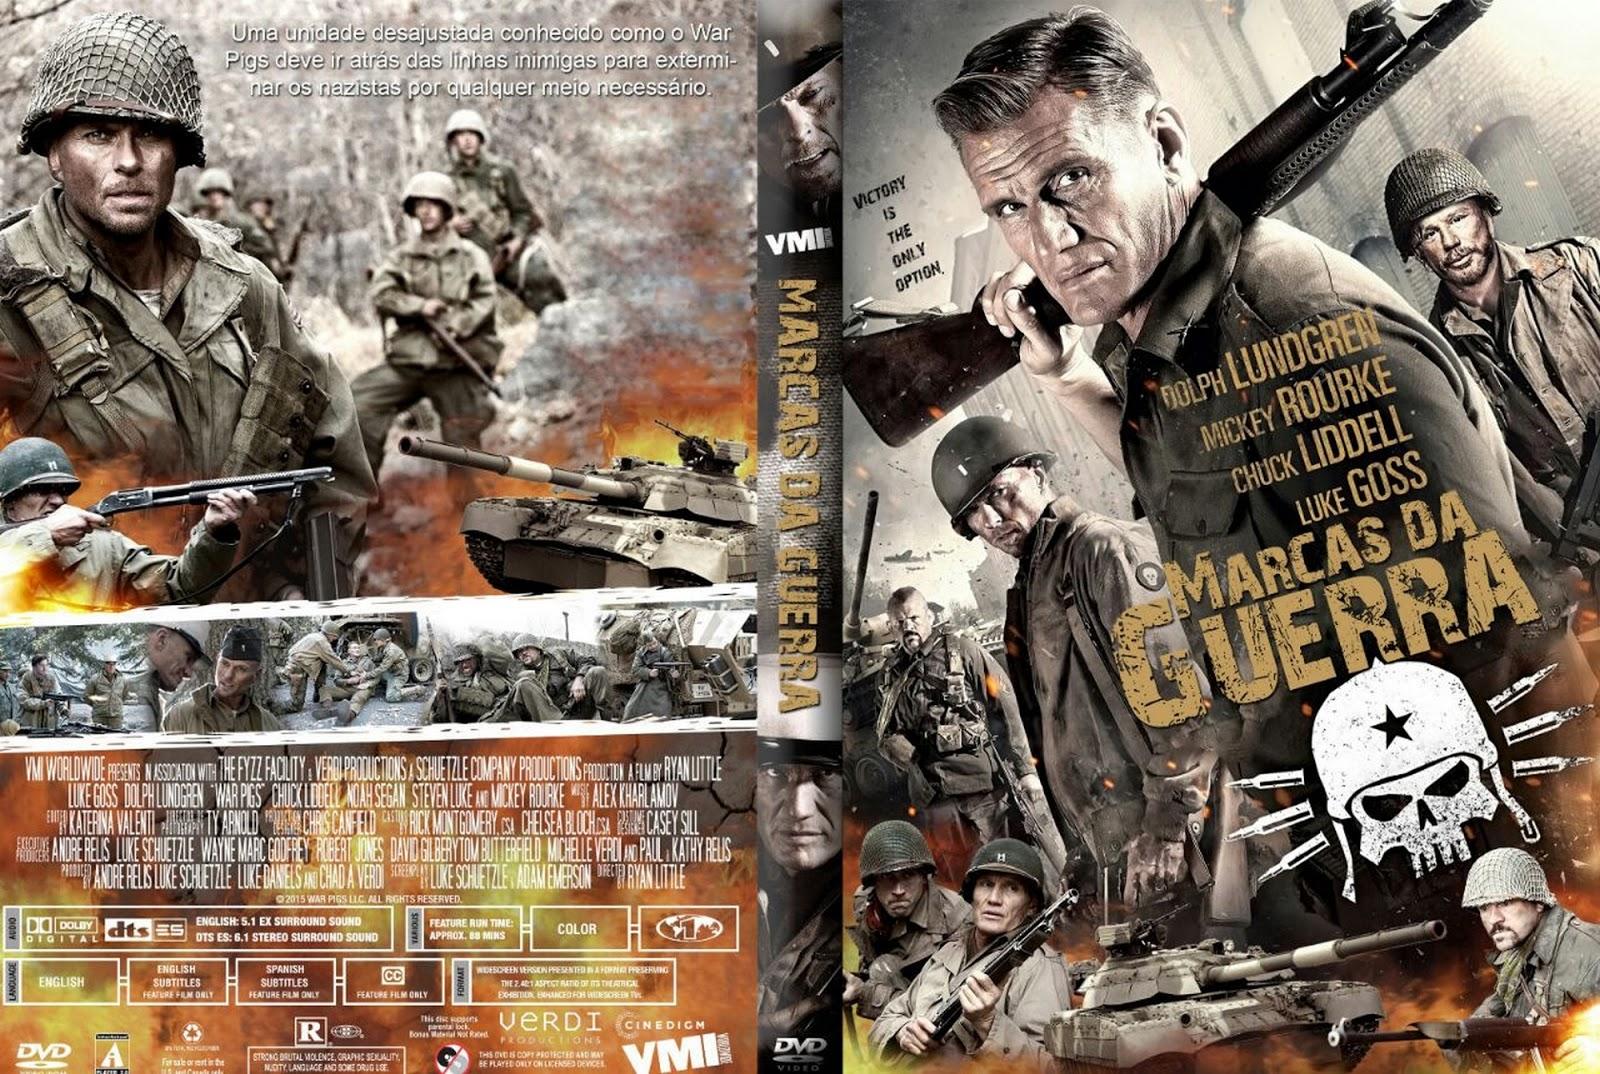 Filme Marcas Da Guerra pertaining to marcas da guerra dvd-r